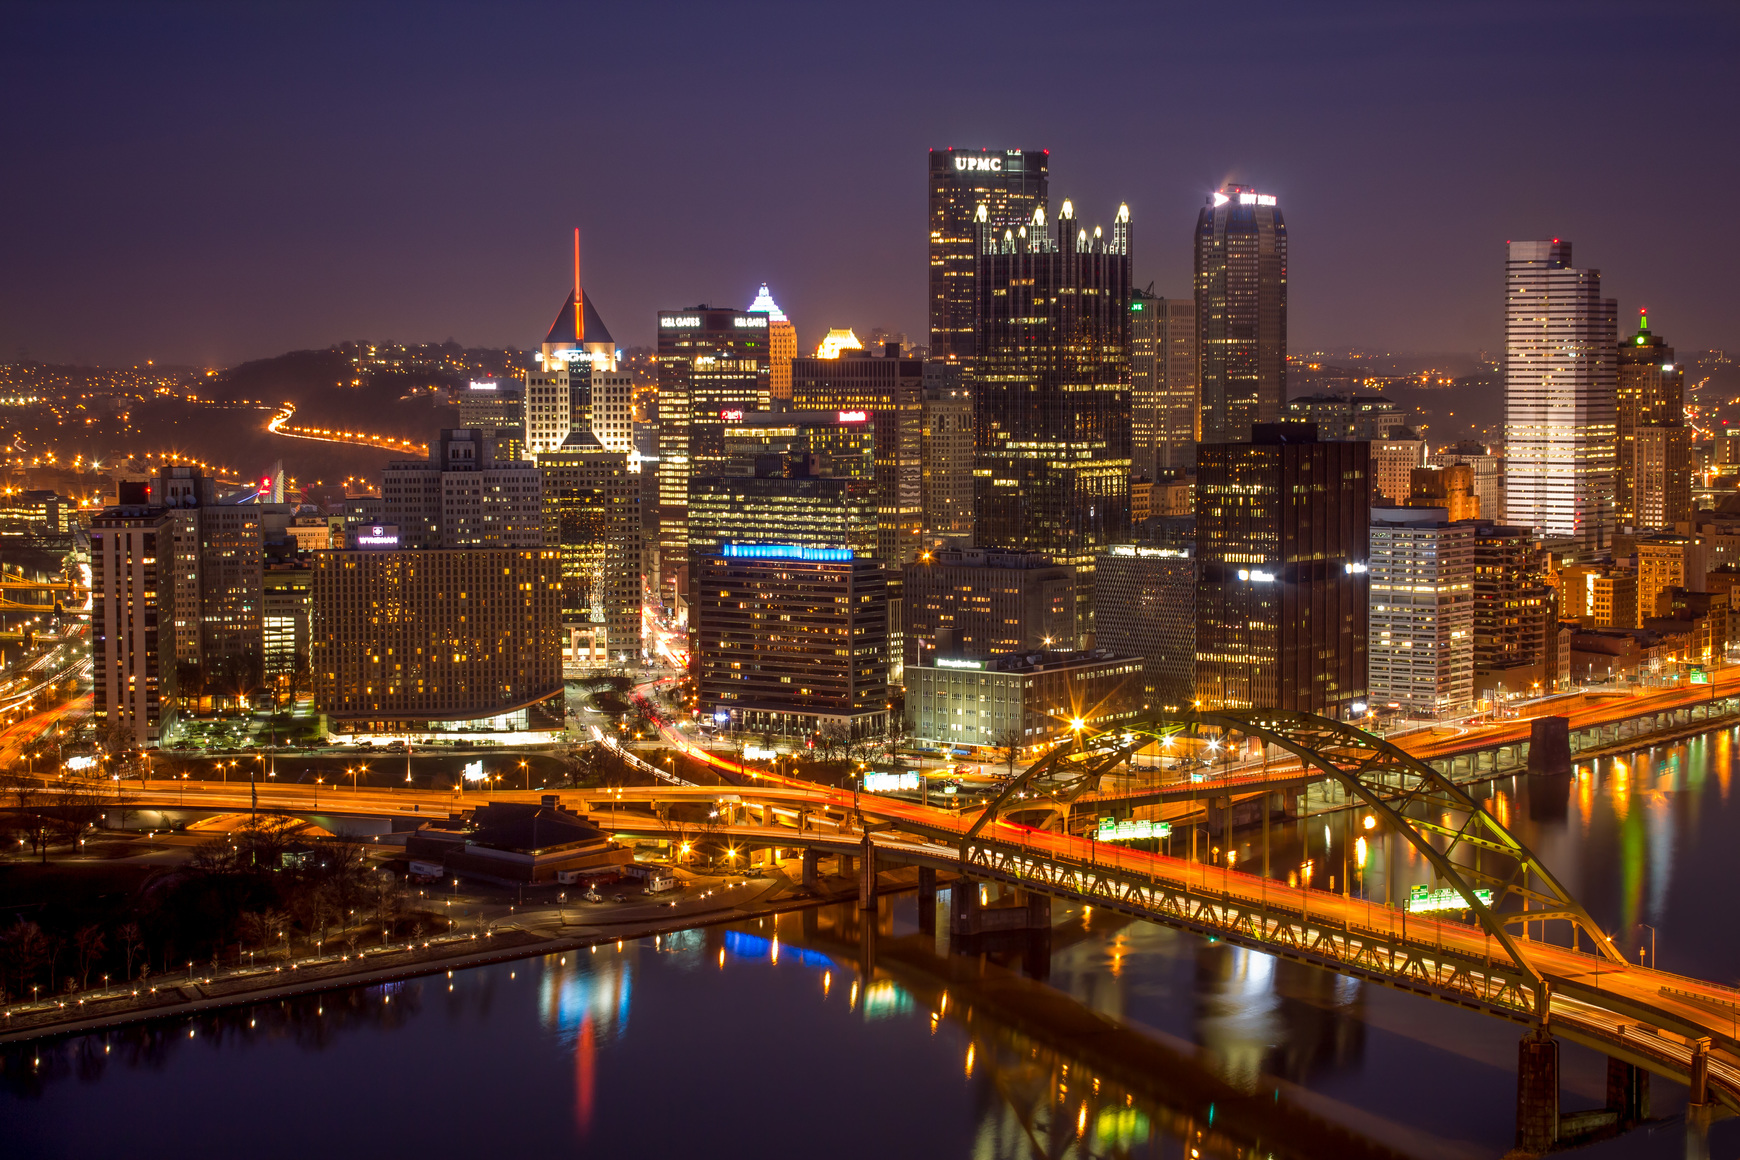 Pittsburgh Desktop Wallpaper Skyline: What To Do Over Thanksgiving Break: Pittsburgh Edition